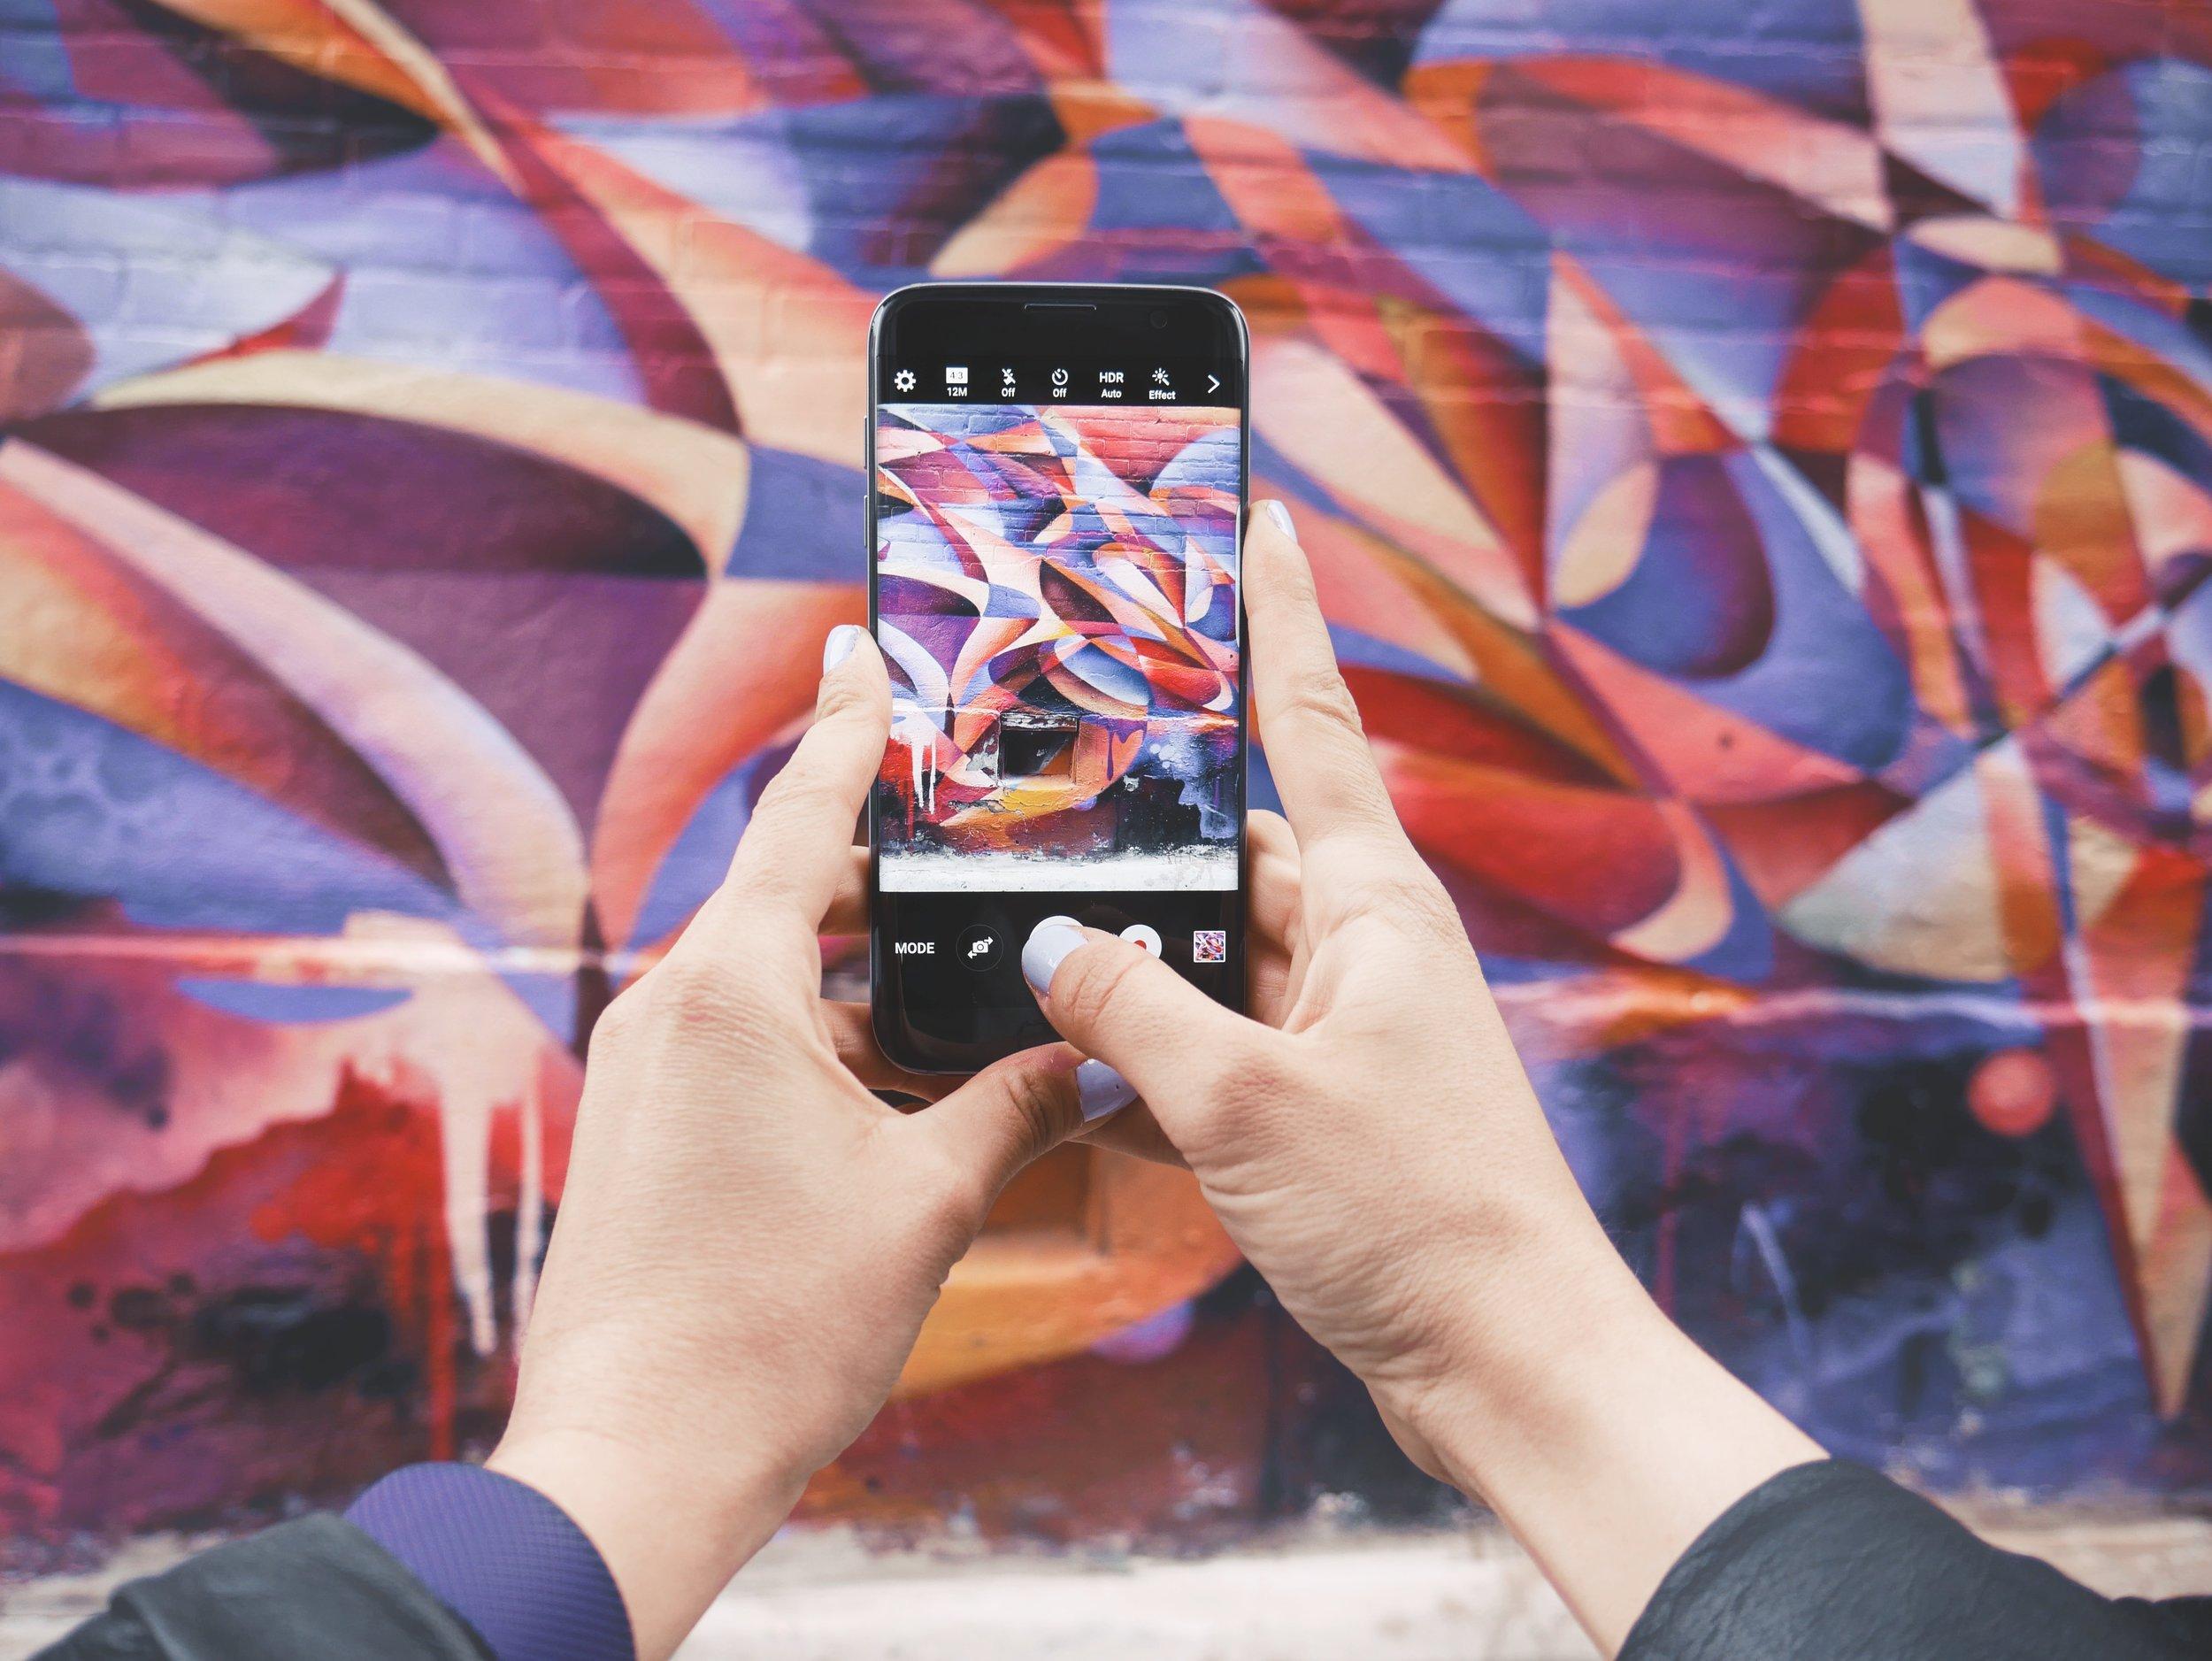 Smart phone taking picture of graffiti mural